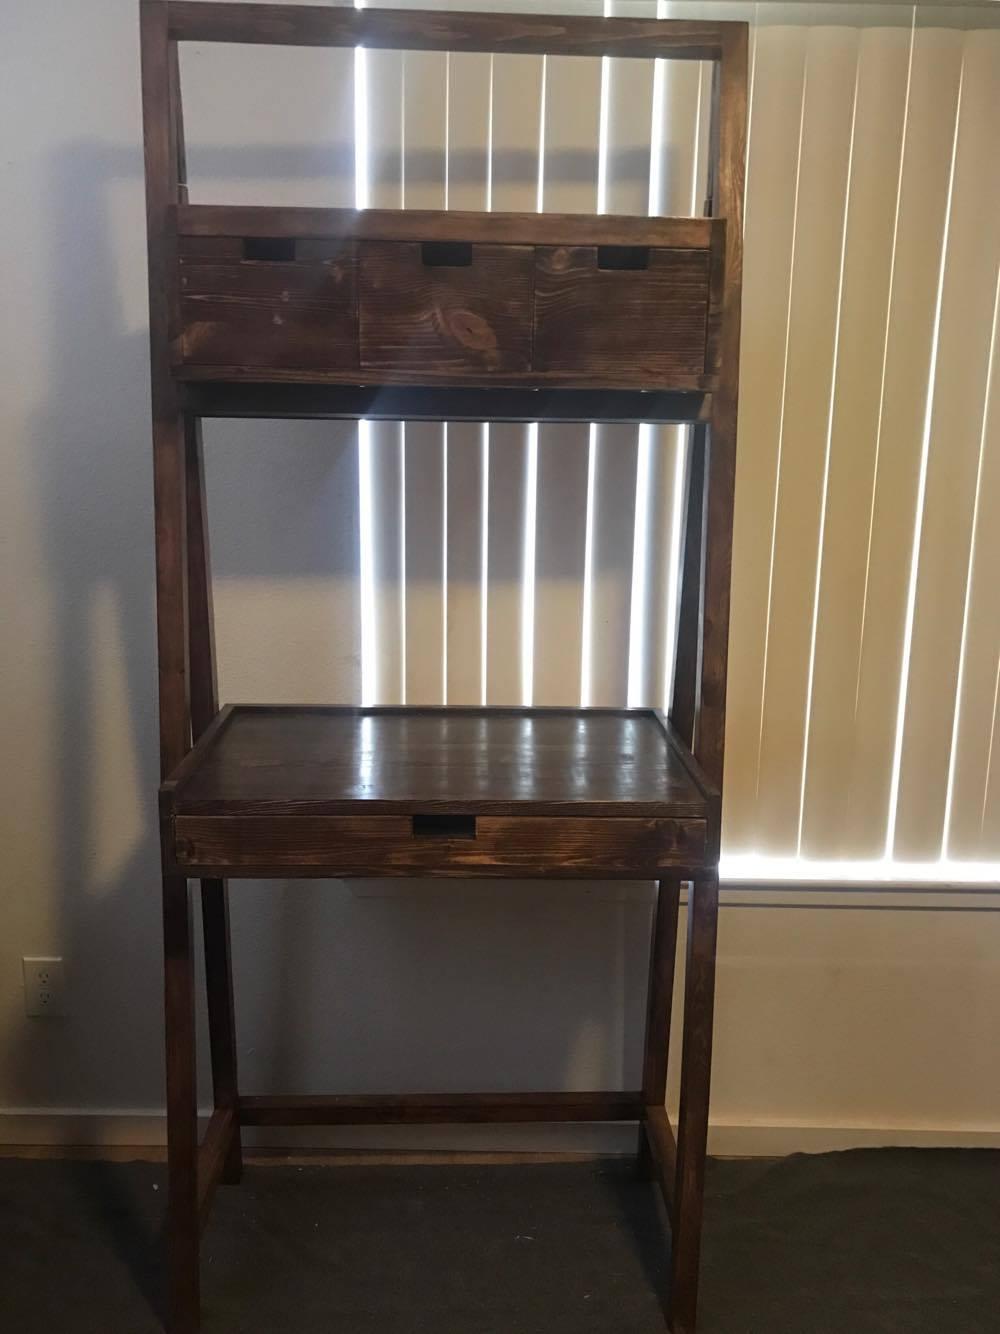 shelf units living room zebra print set ross ladder desk and – elon's